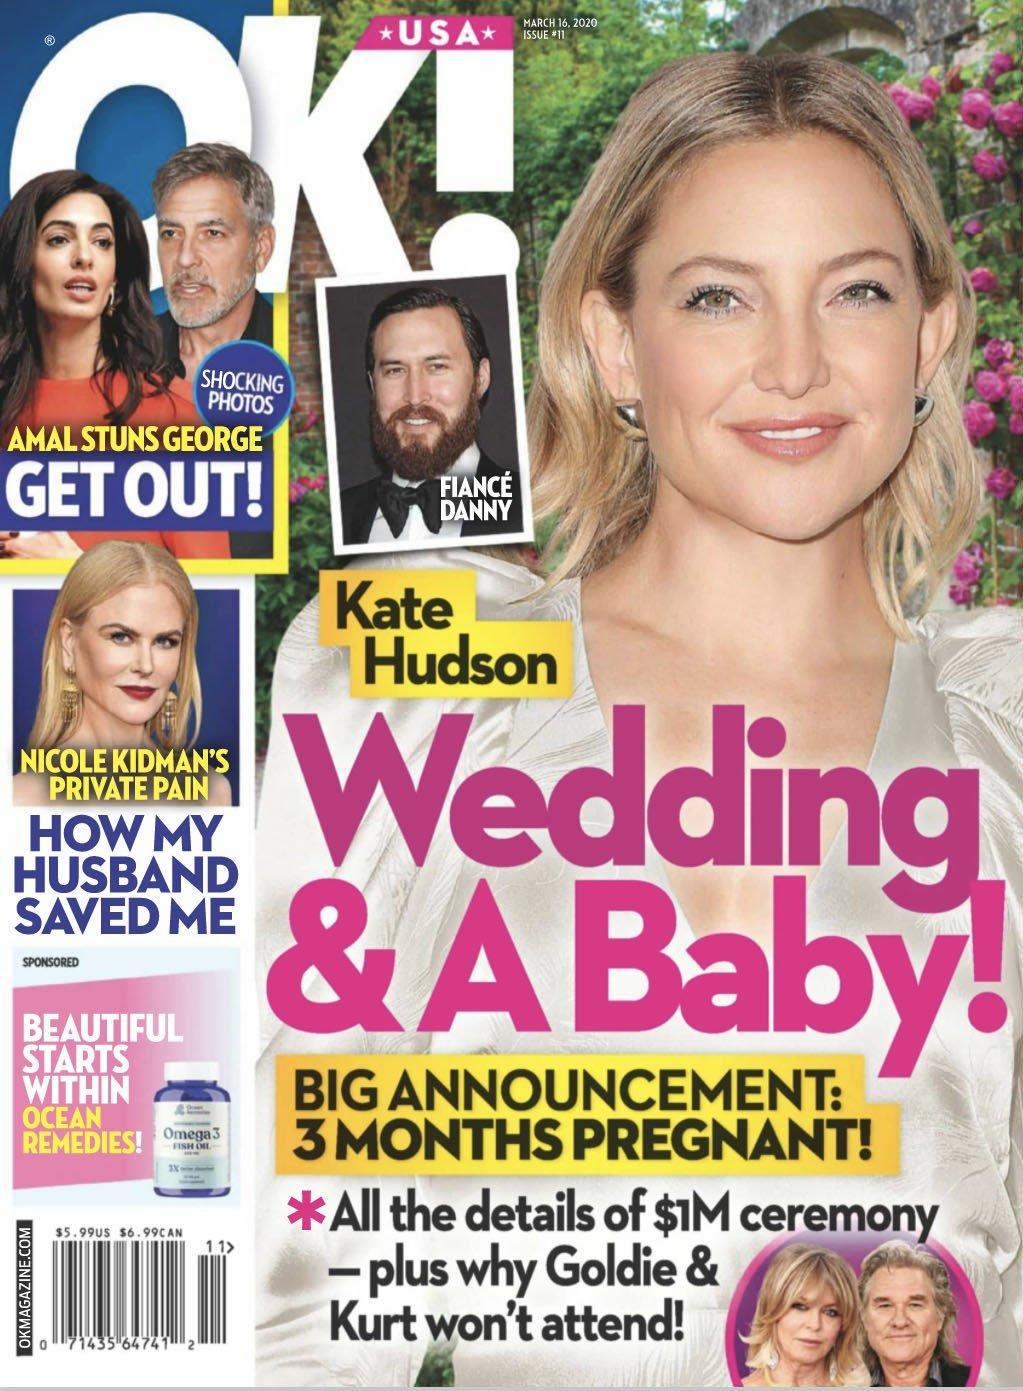 Kate Hudson on the cover of OK! Magazine